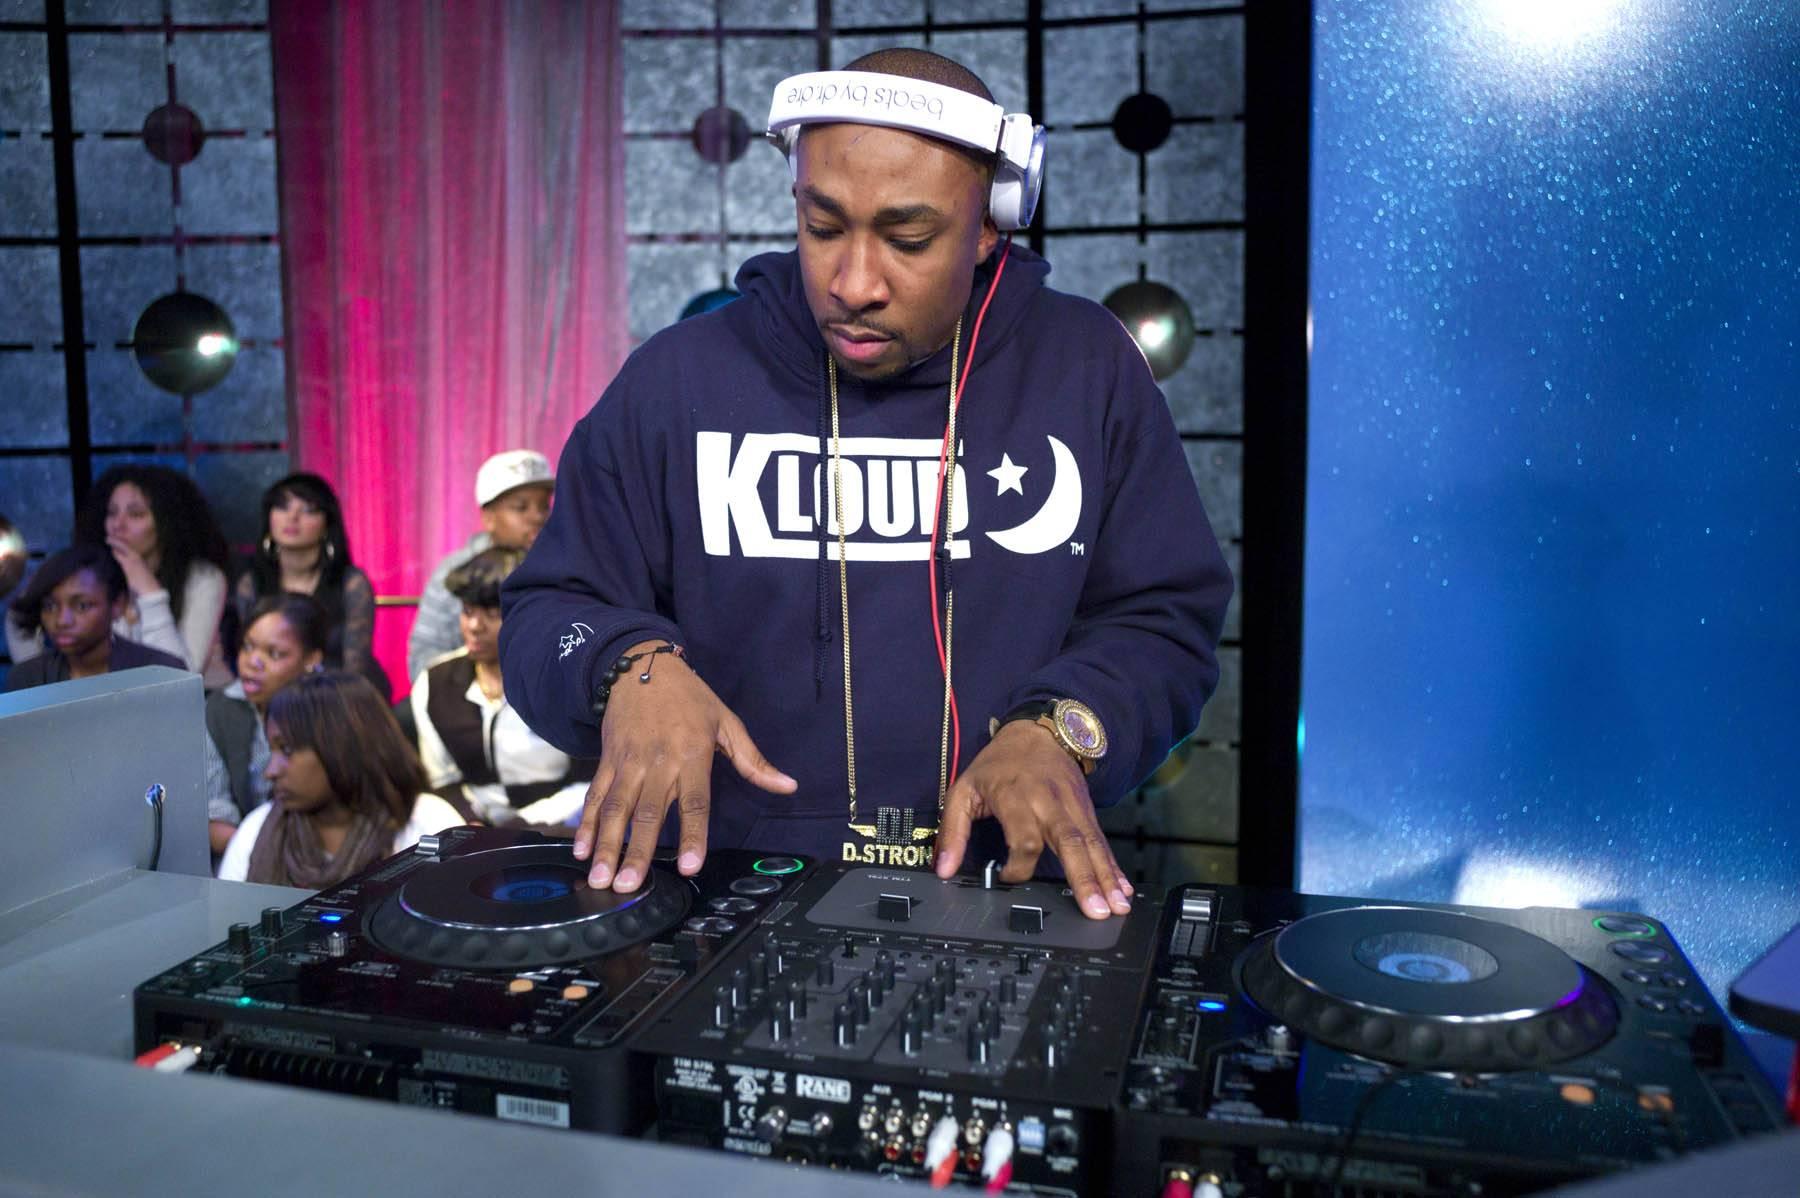 Spinning All Night - DJ Strong at 106 & Park, January 27, 2012. (Photo: John Ricard / BET)